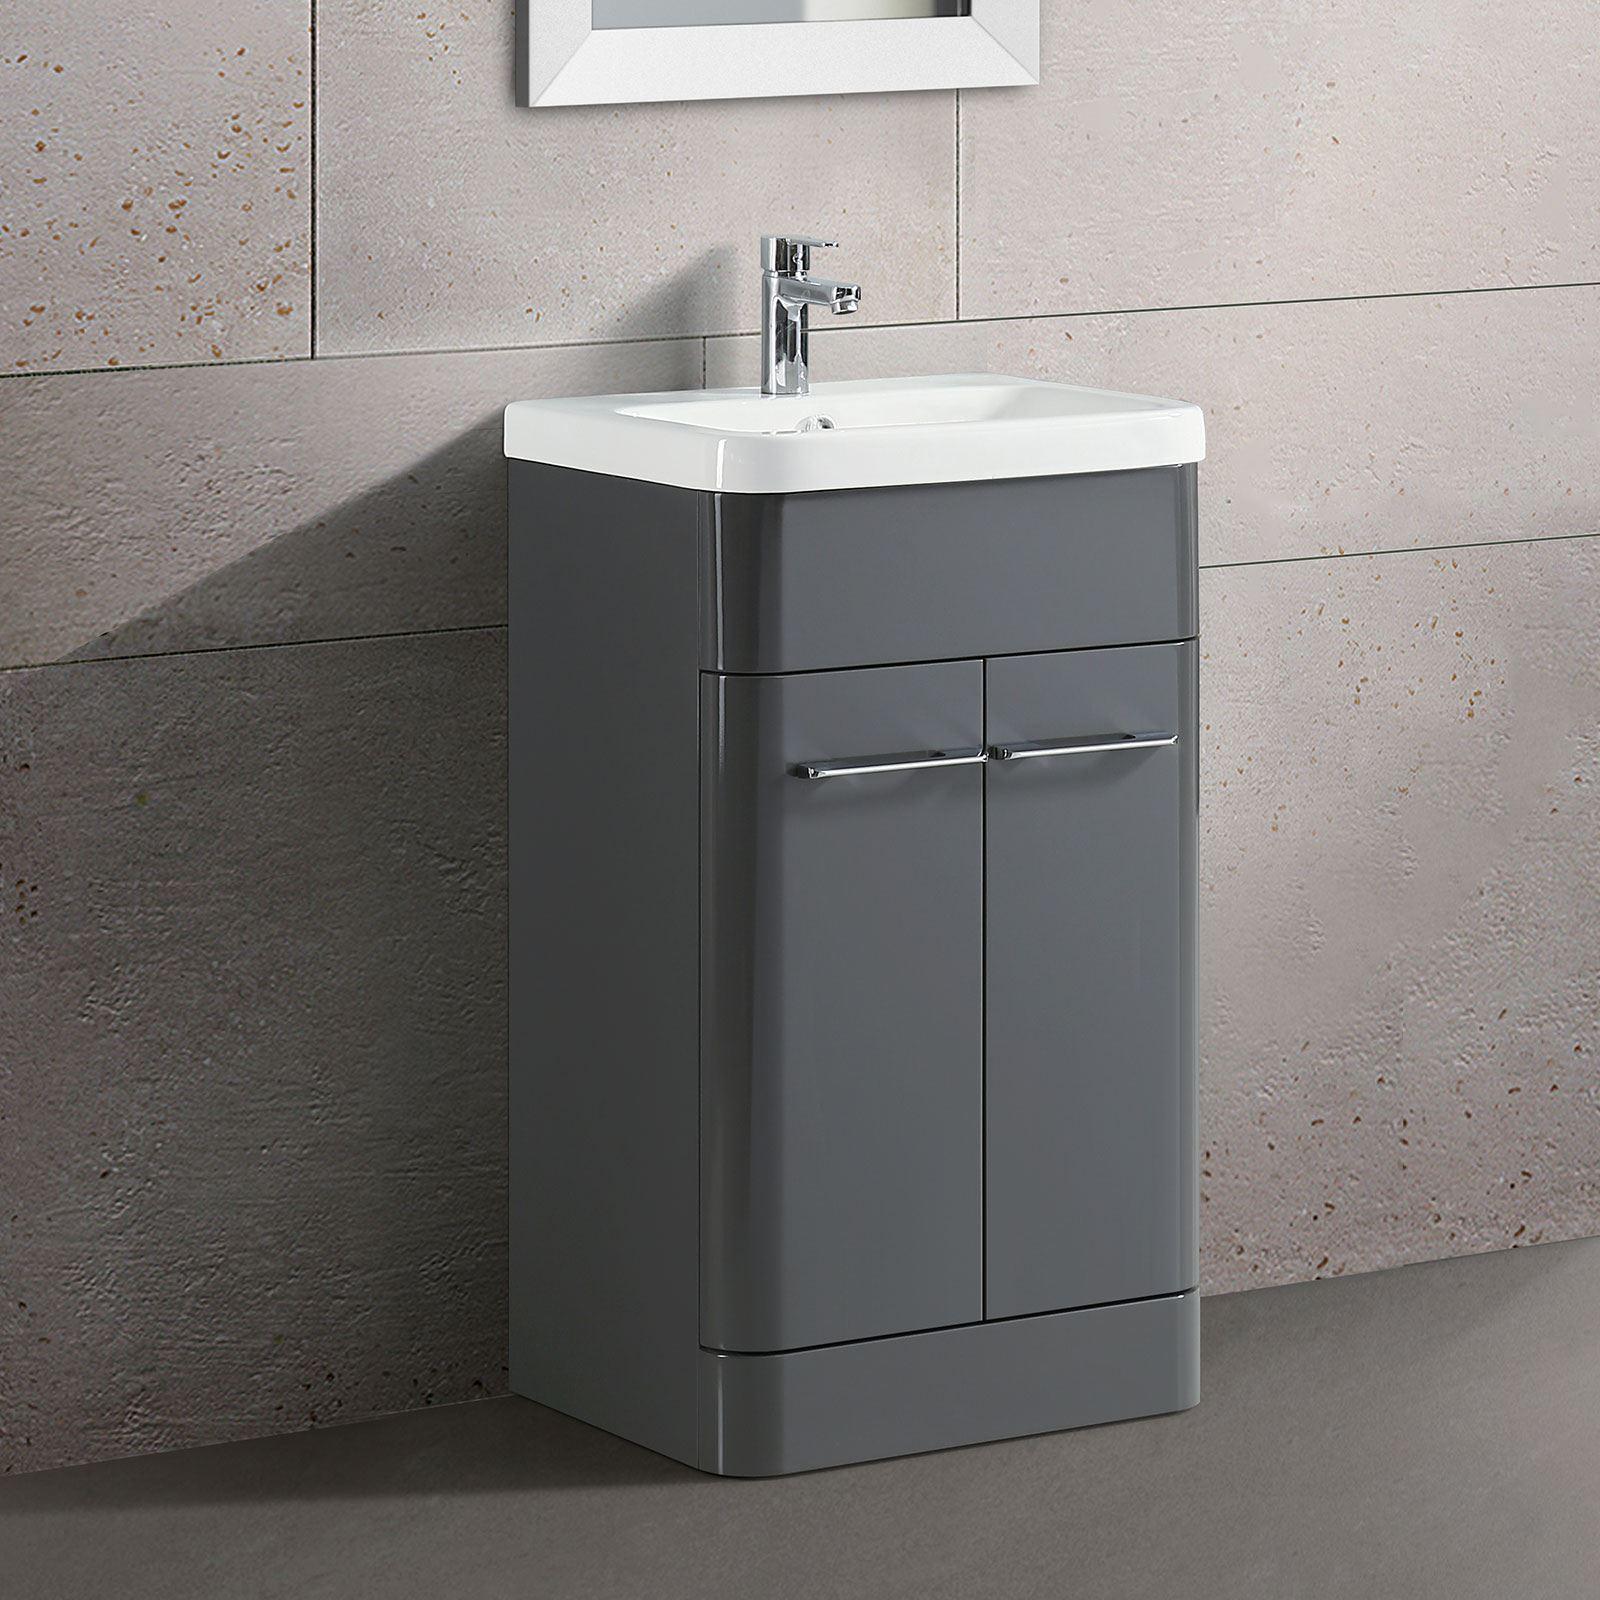 Details about TOREX FREESTANDING BATHROOM VANITY UNIT CERAMIC BASIN CABINET  GLOSS GREY 7mm